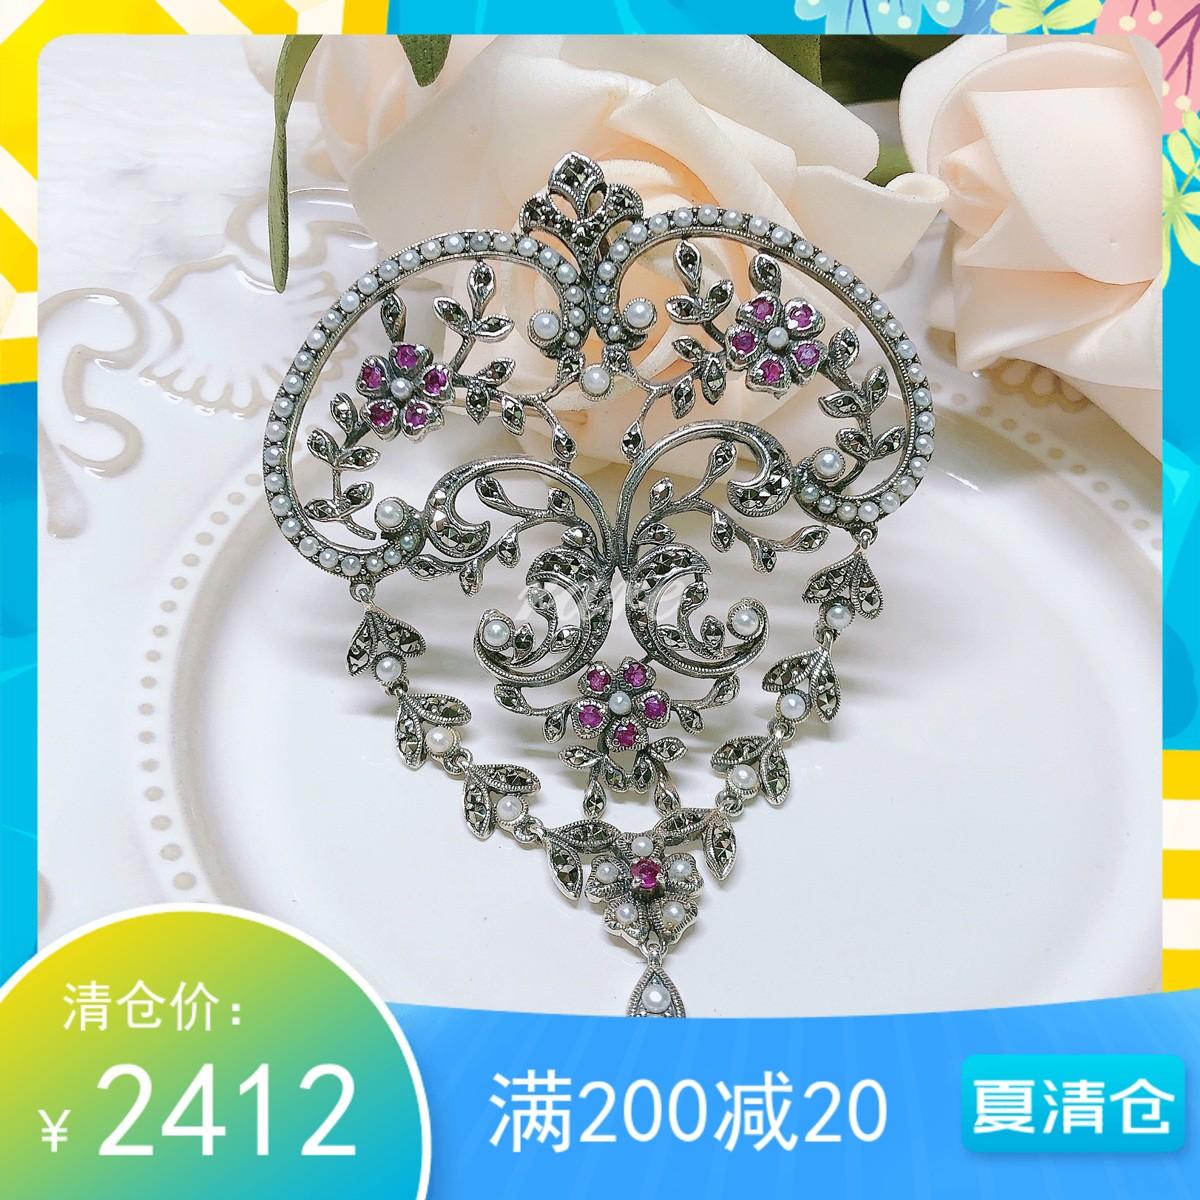 Rare Ruiya Caizhen series 925 Silver Ruby millet Pearl Brooch Pendant dual purpose 207c0013